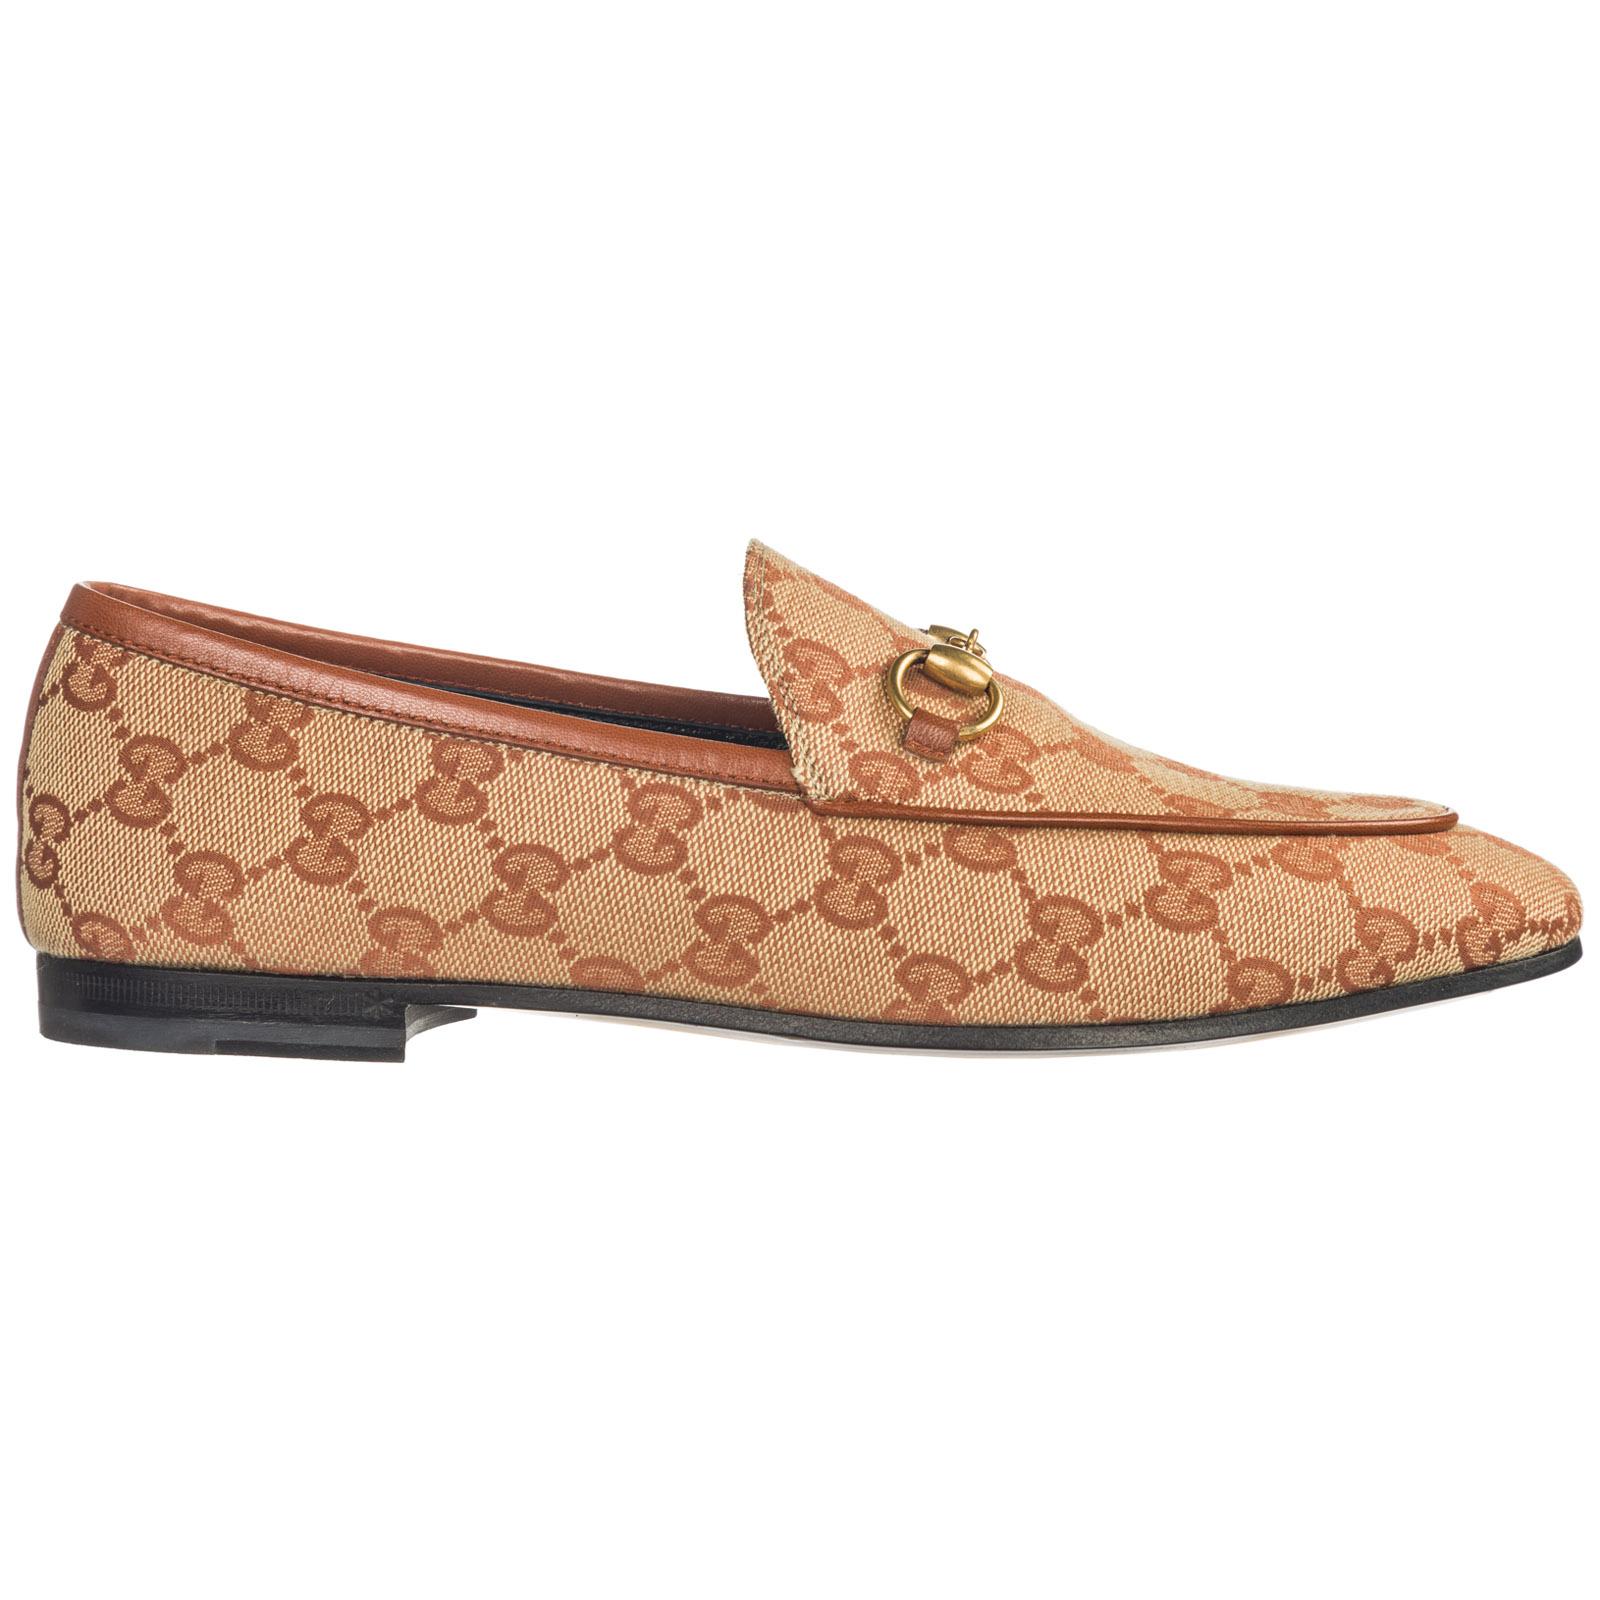 811c698b9a48 Gucci 10Mm Jordan Gg Supreme Canvas Loafers In 8378 Gg Beige